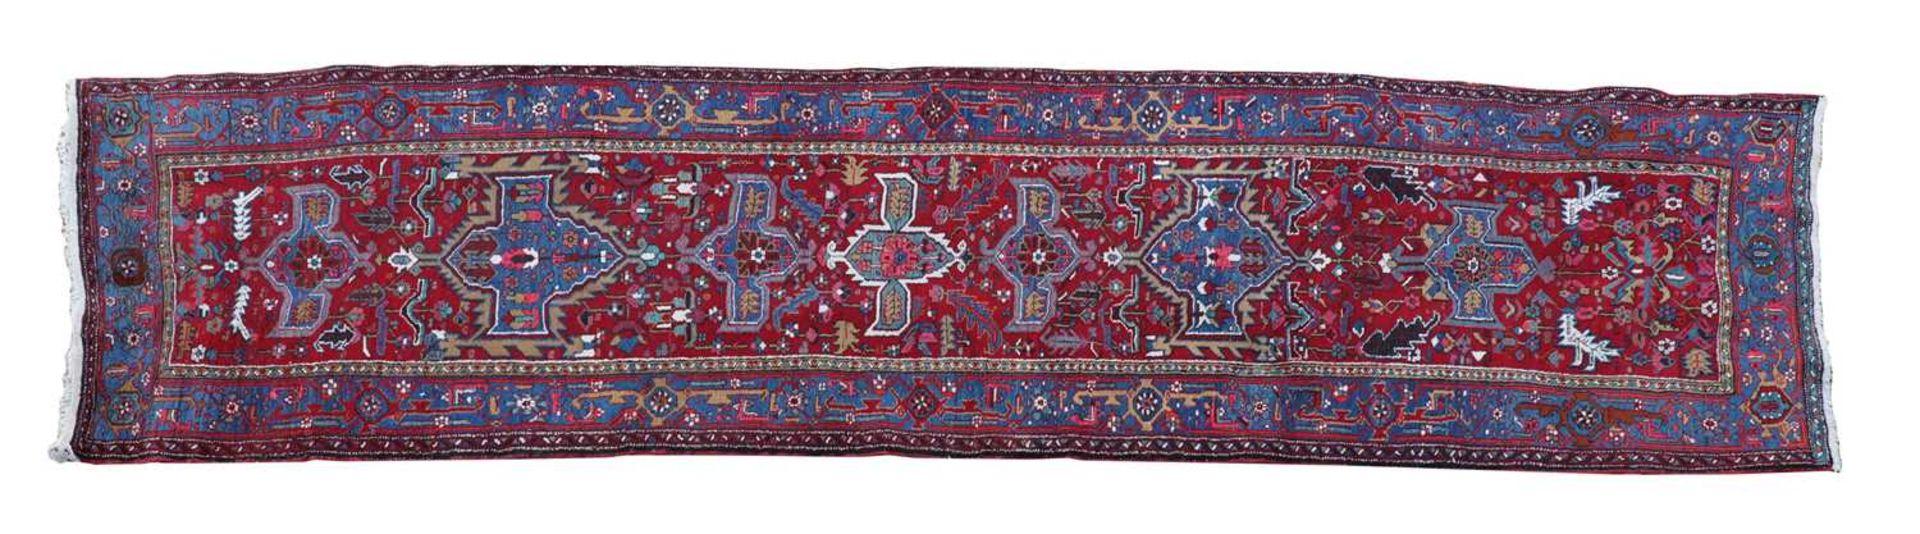 A Persian Heriz runner,